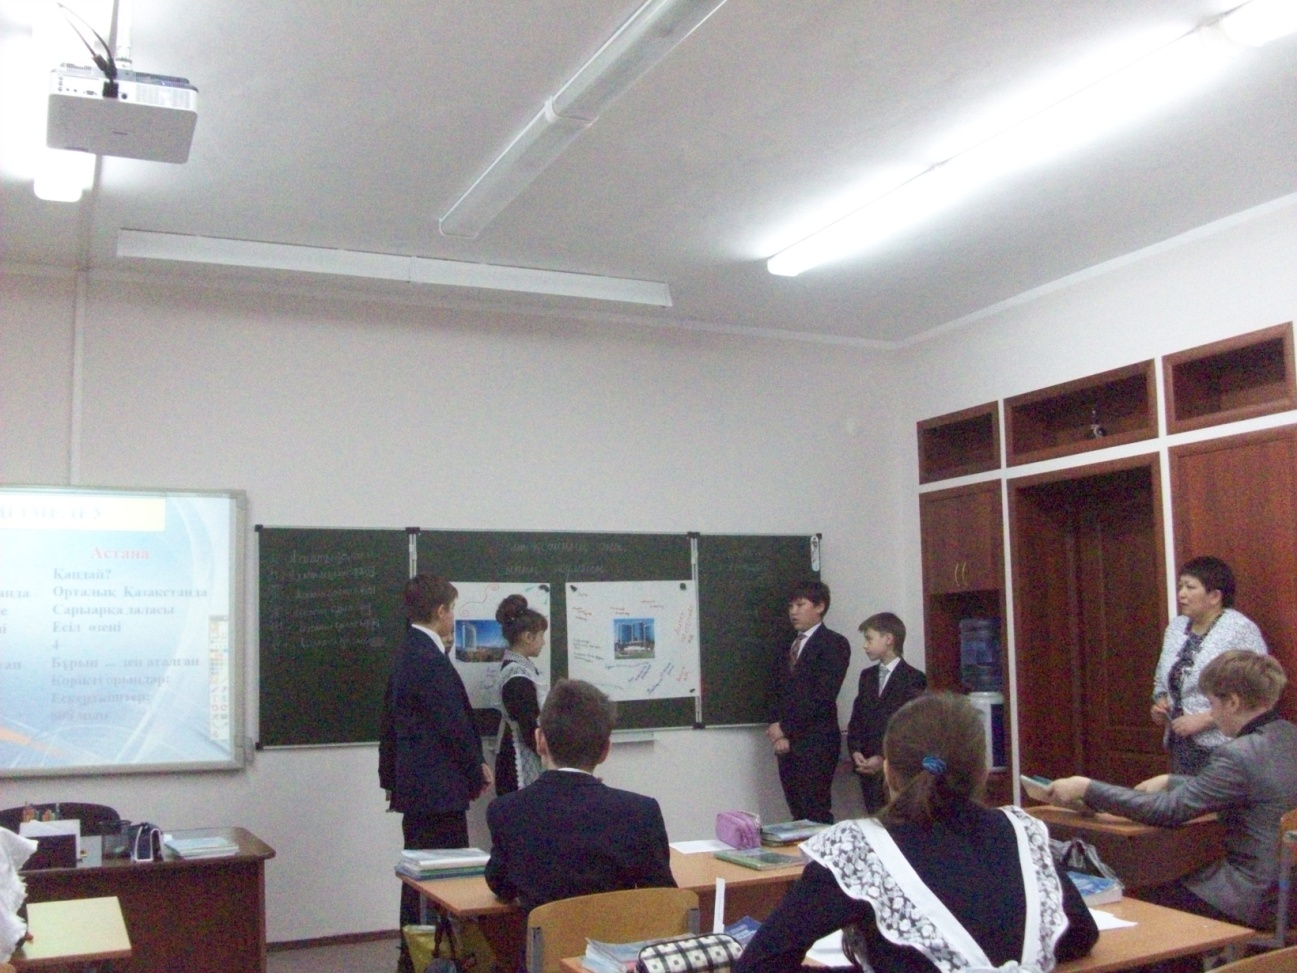 E:\Foto\Школа\урок открытый\102_6539.JPG